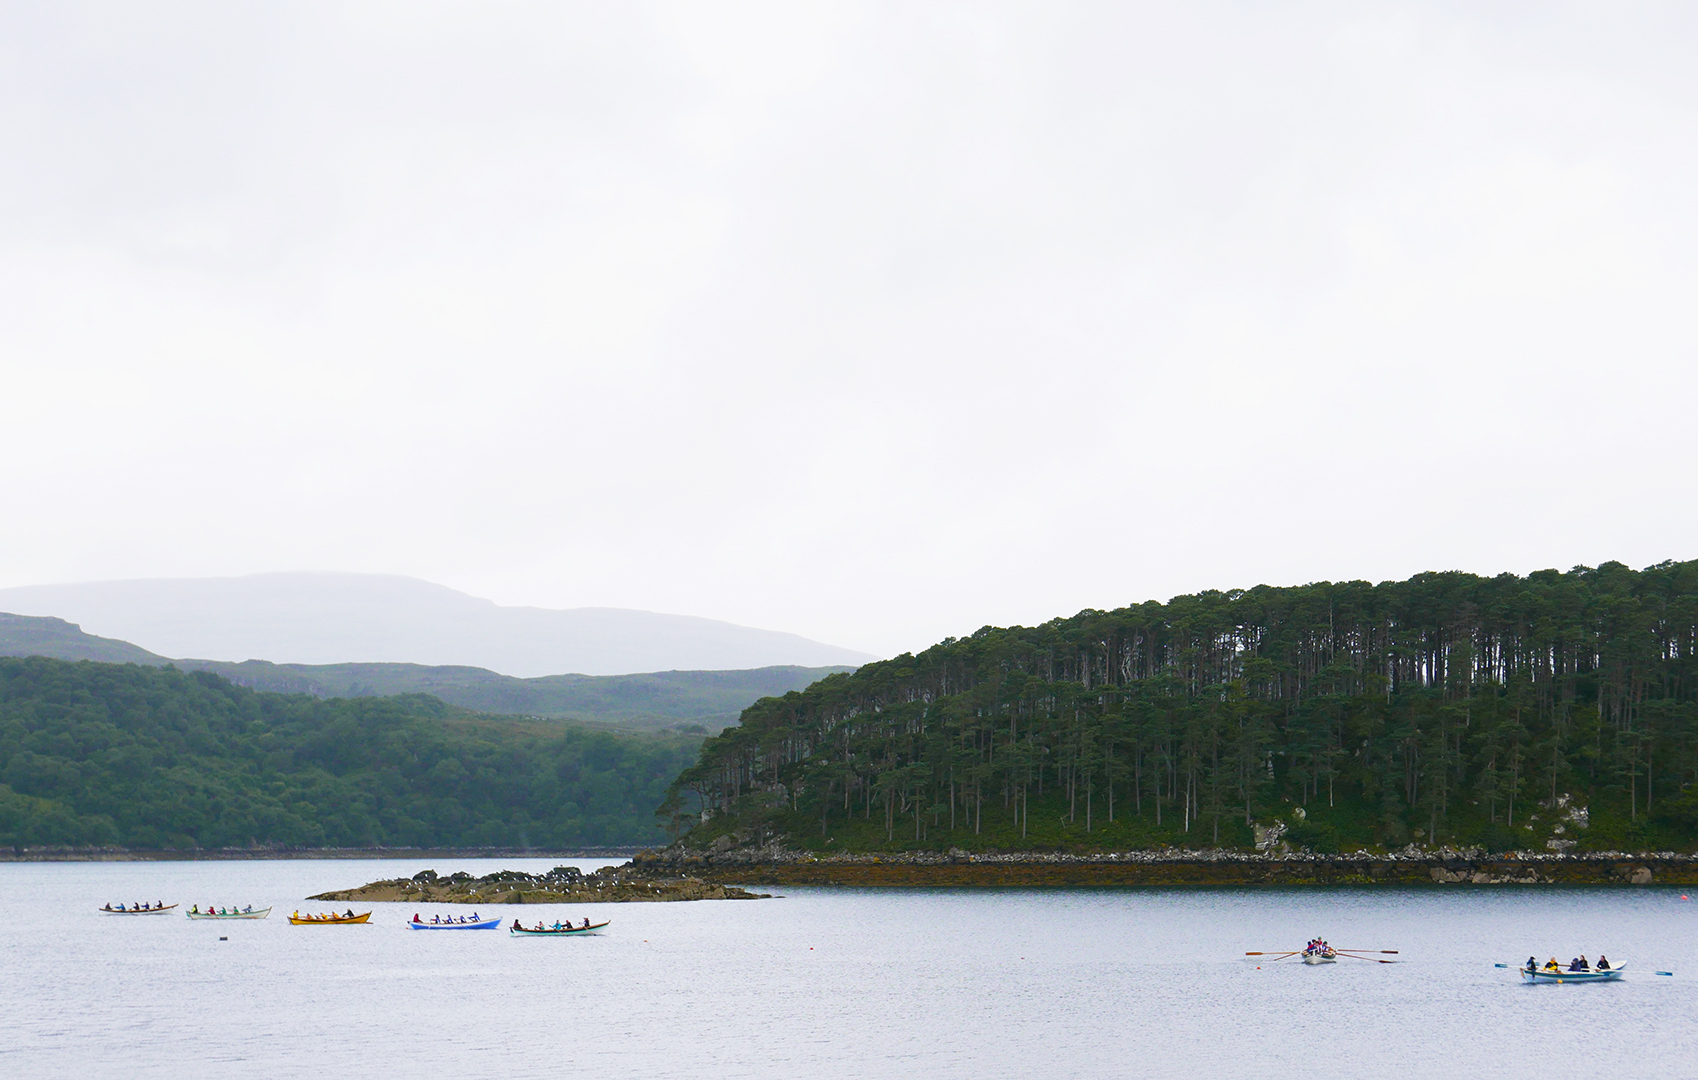 Shieldaig Coastal Rowing Regatta is to take place again this coming Saturday